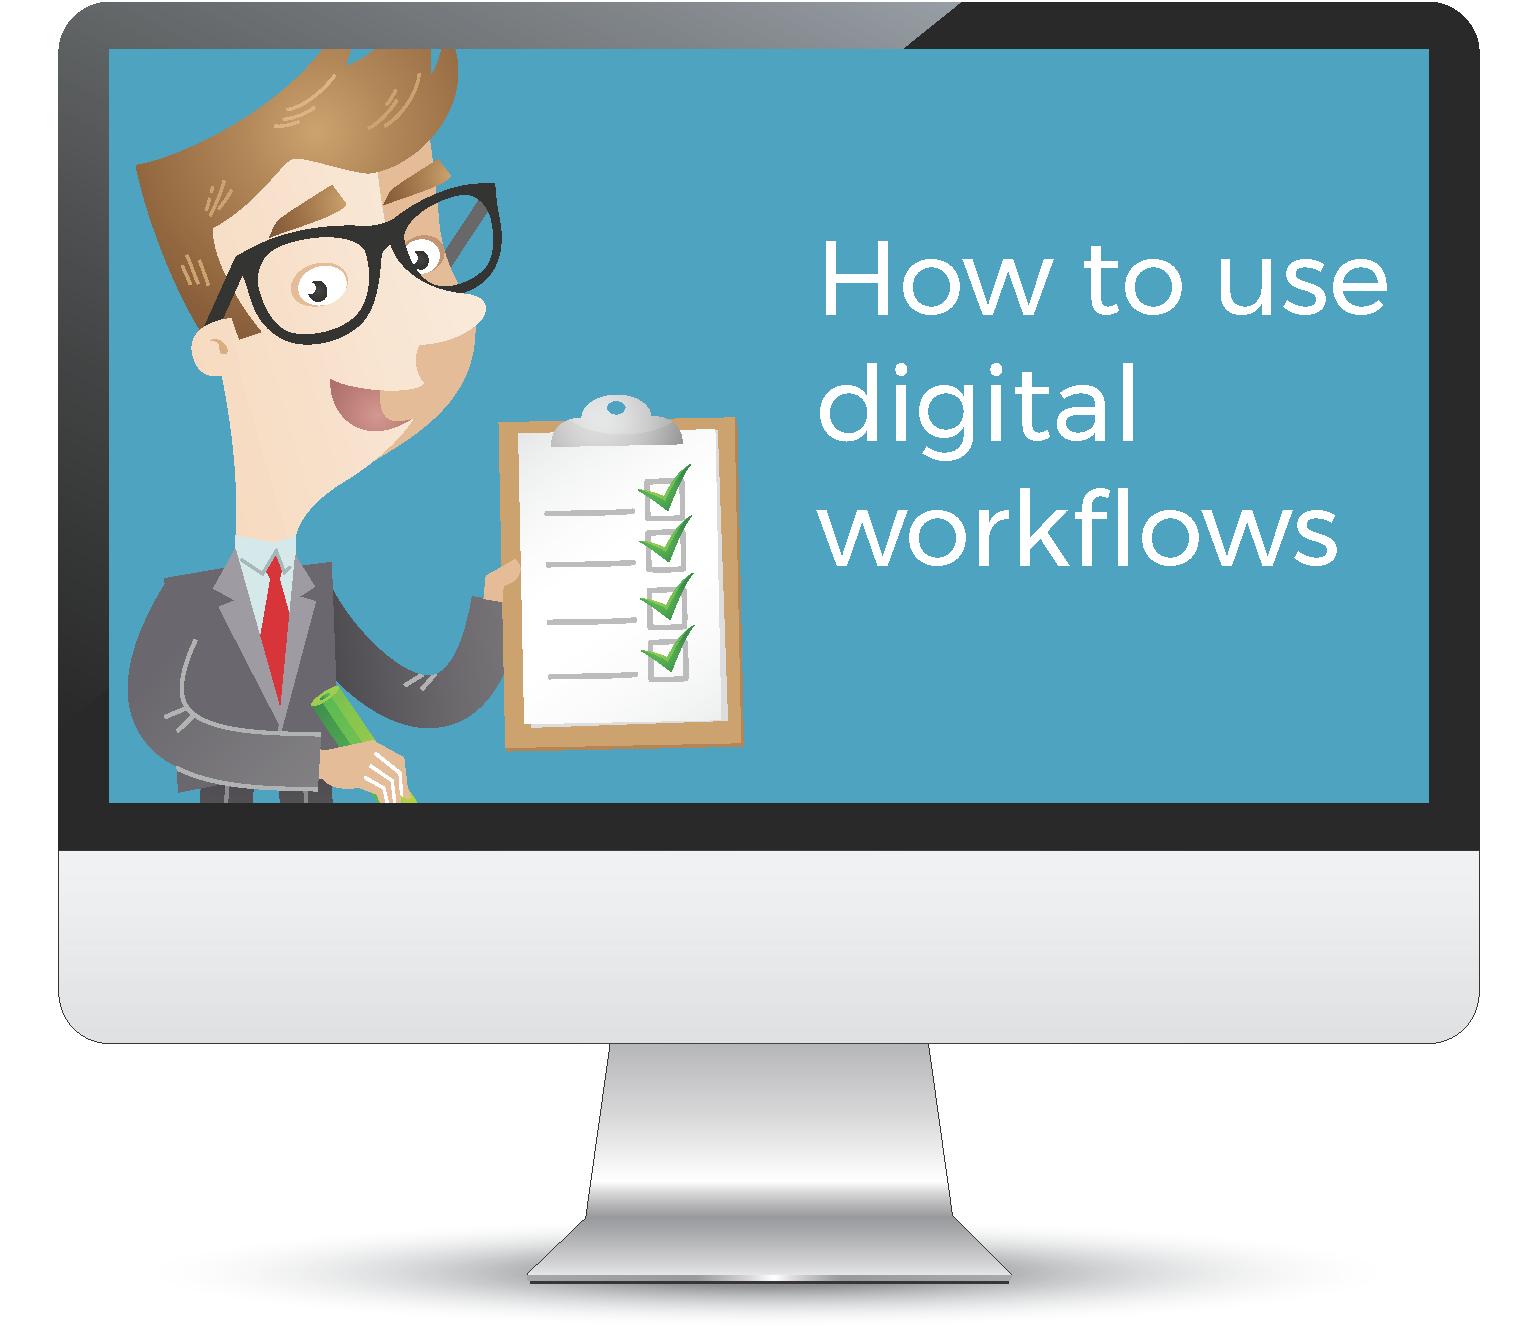 Digital workflows